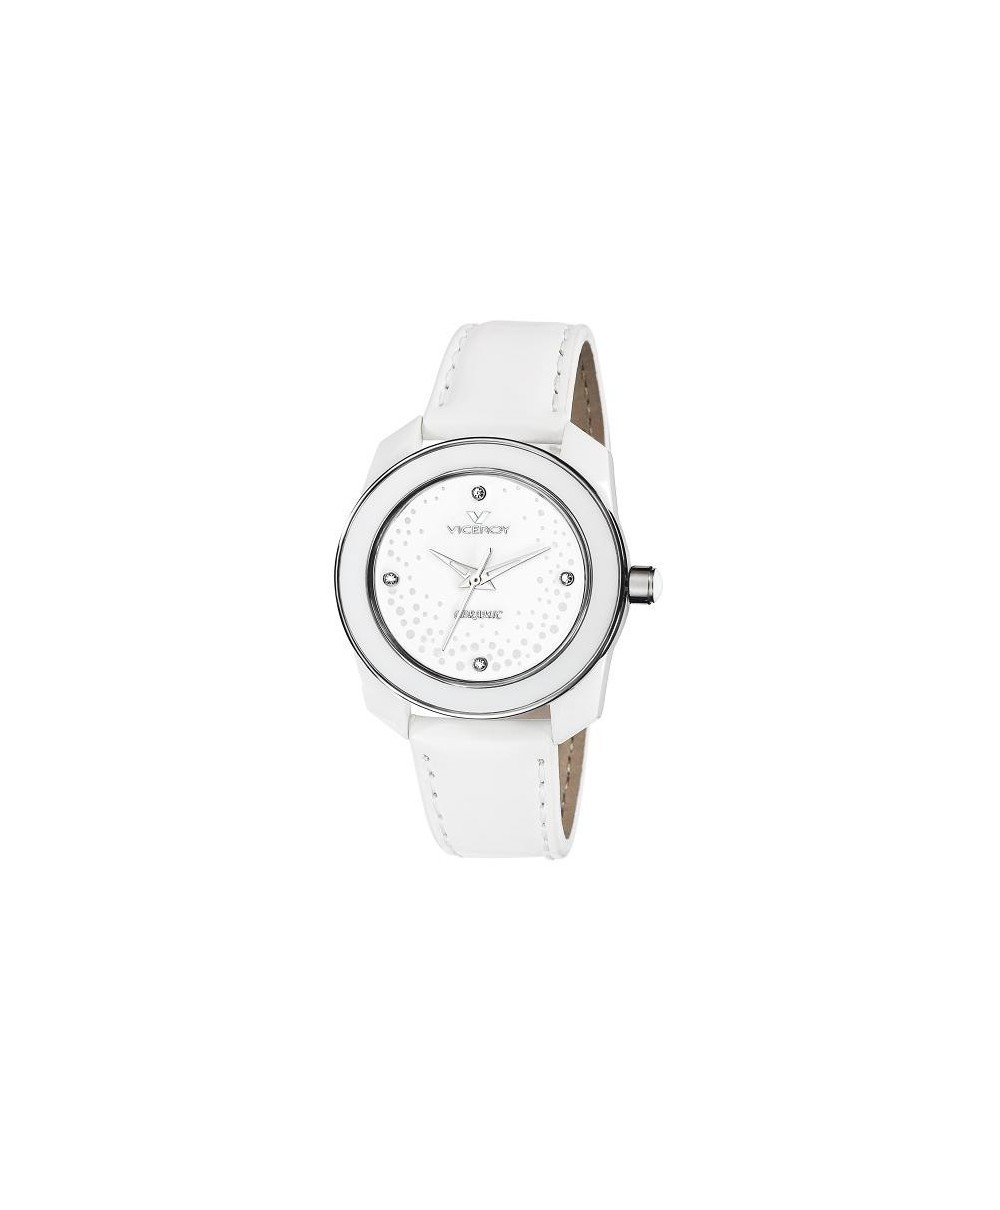 Reloj Viceroy Mujer Cerámica 432148-05